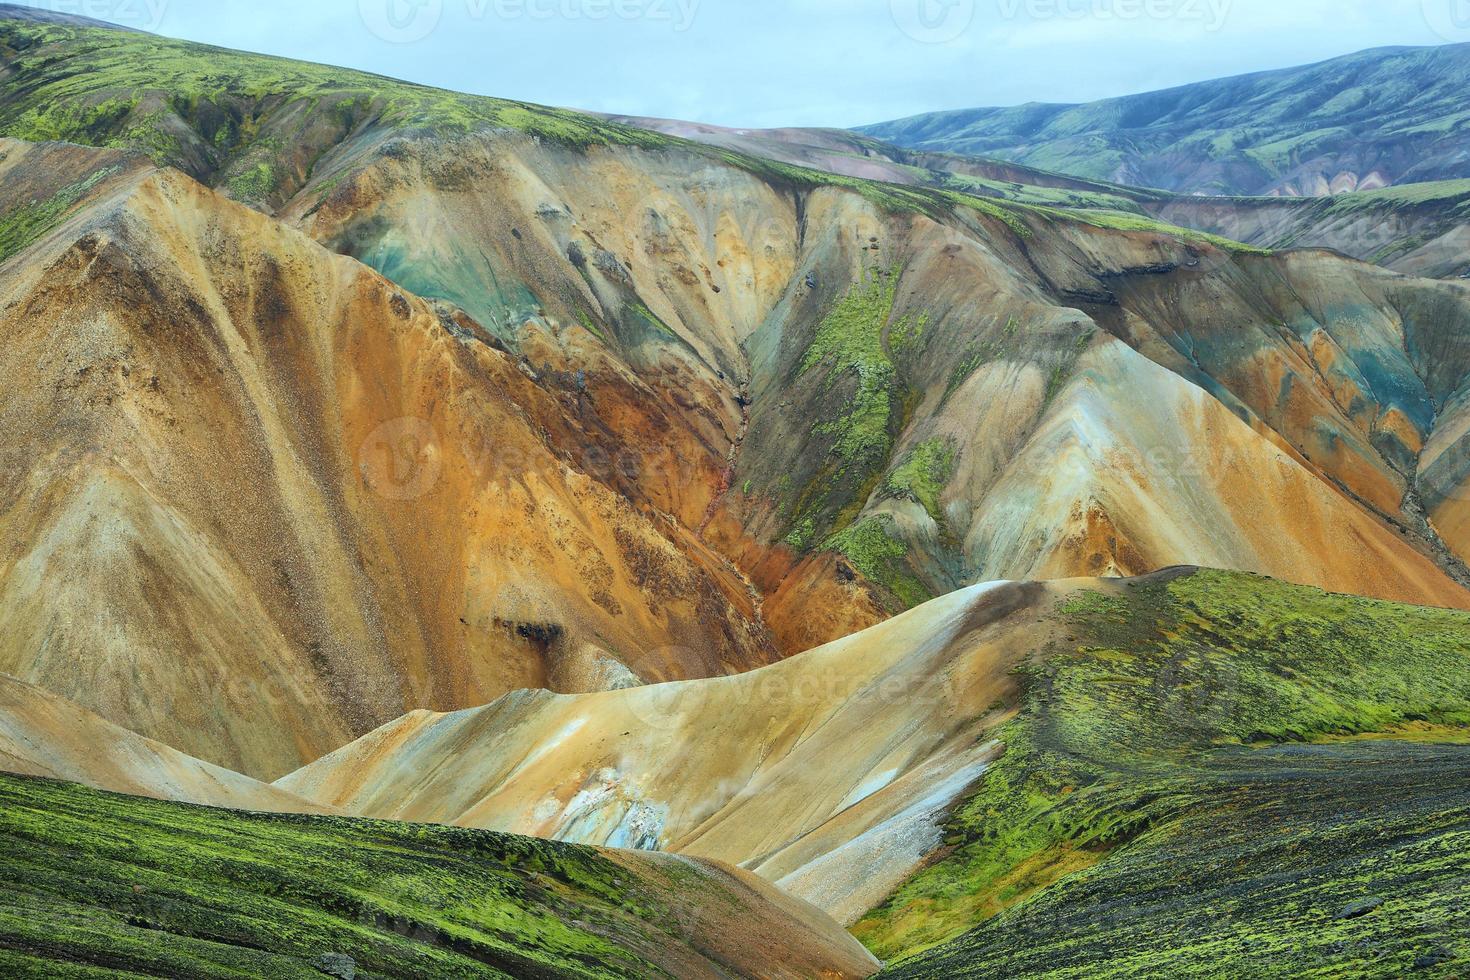 Multicolored mountains at Landmannalaugar, photo